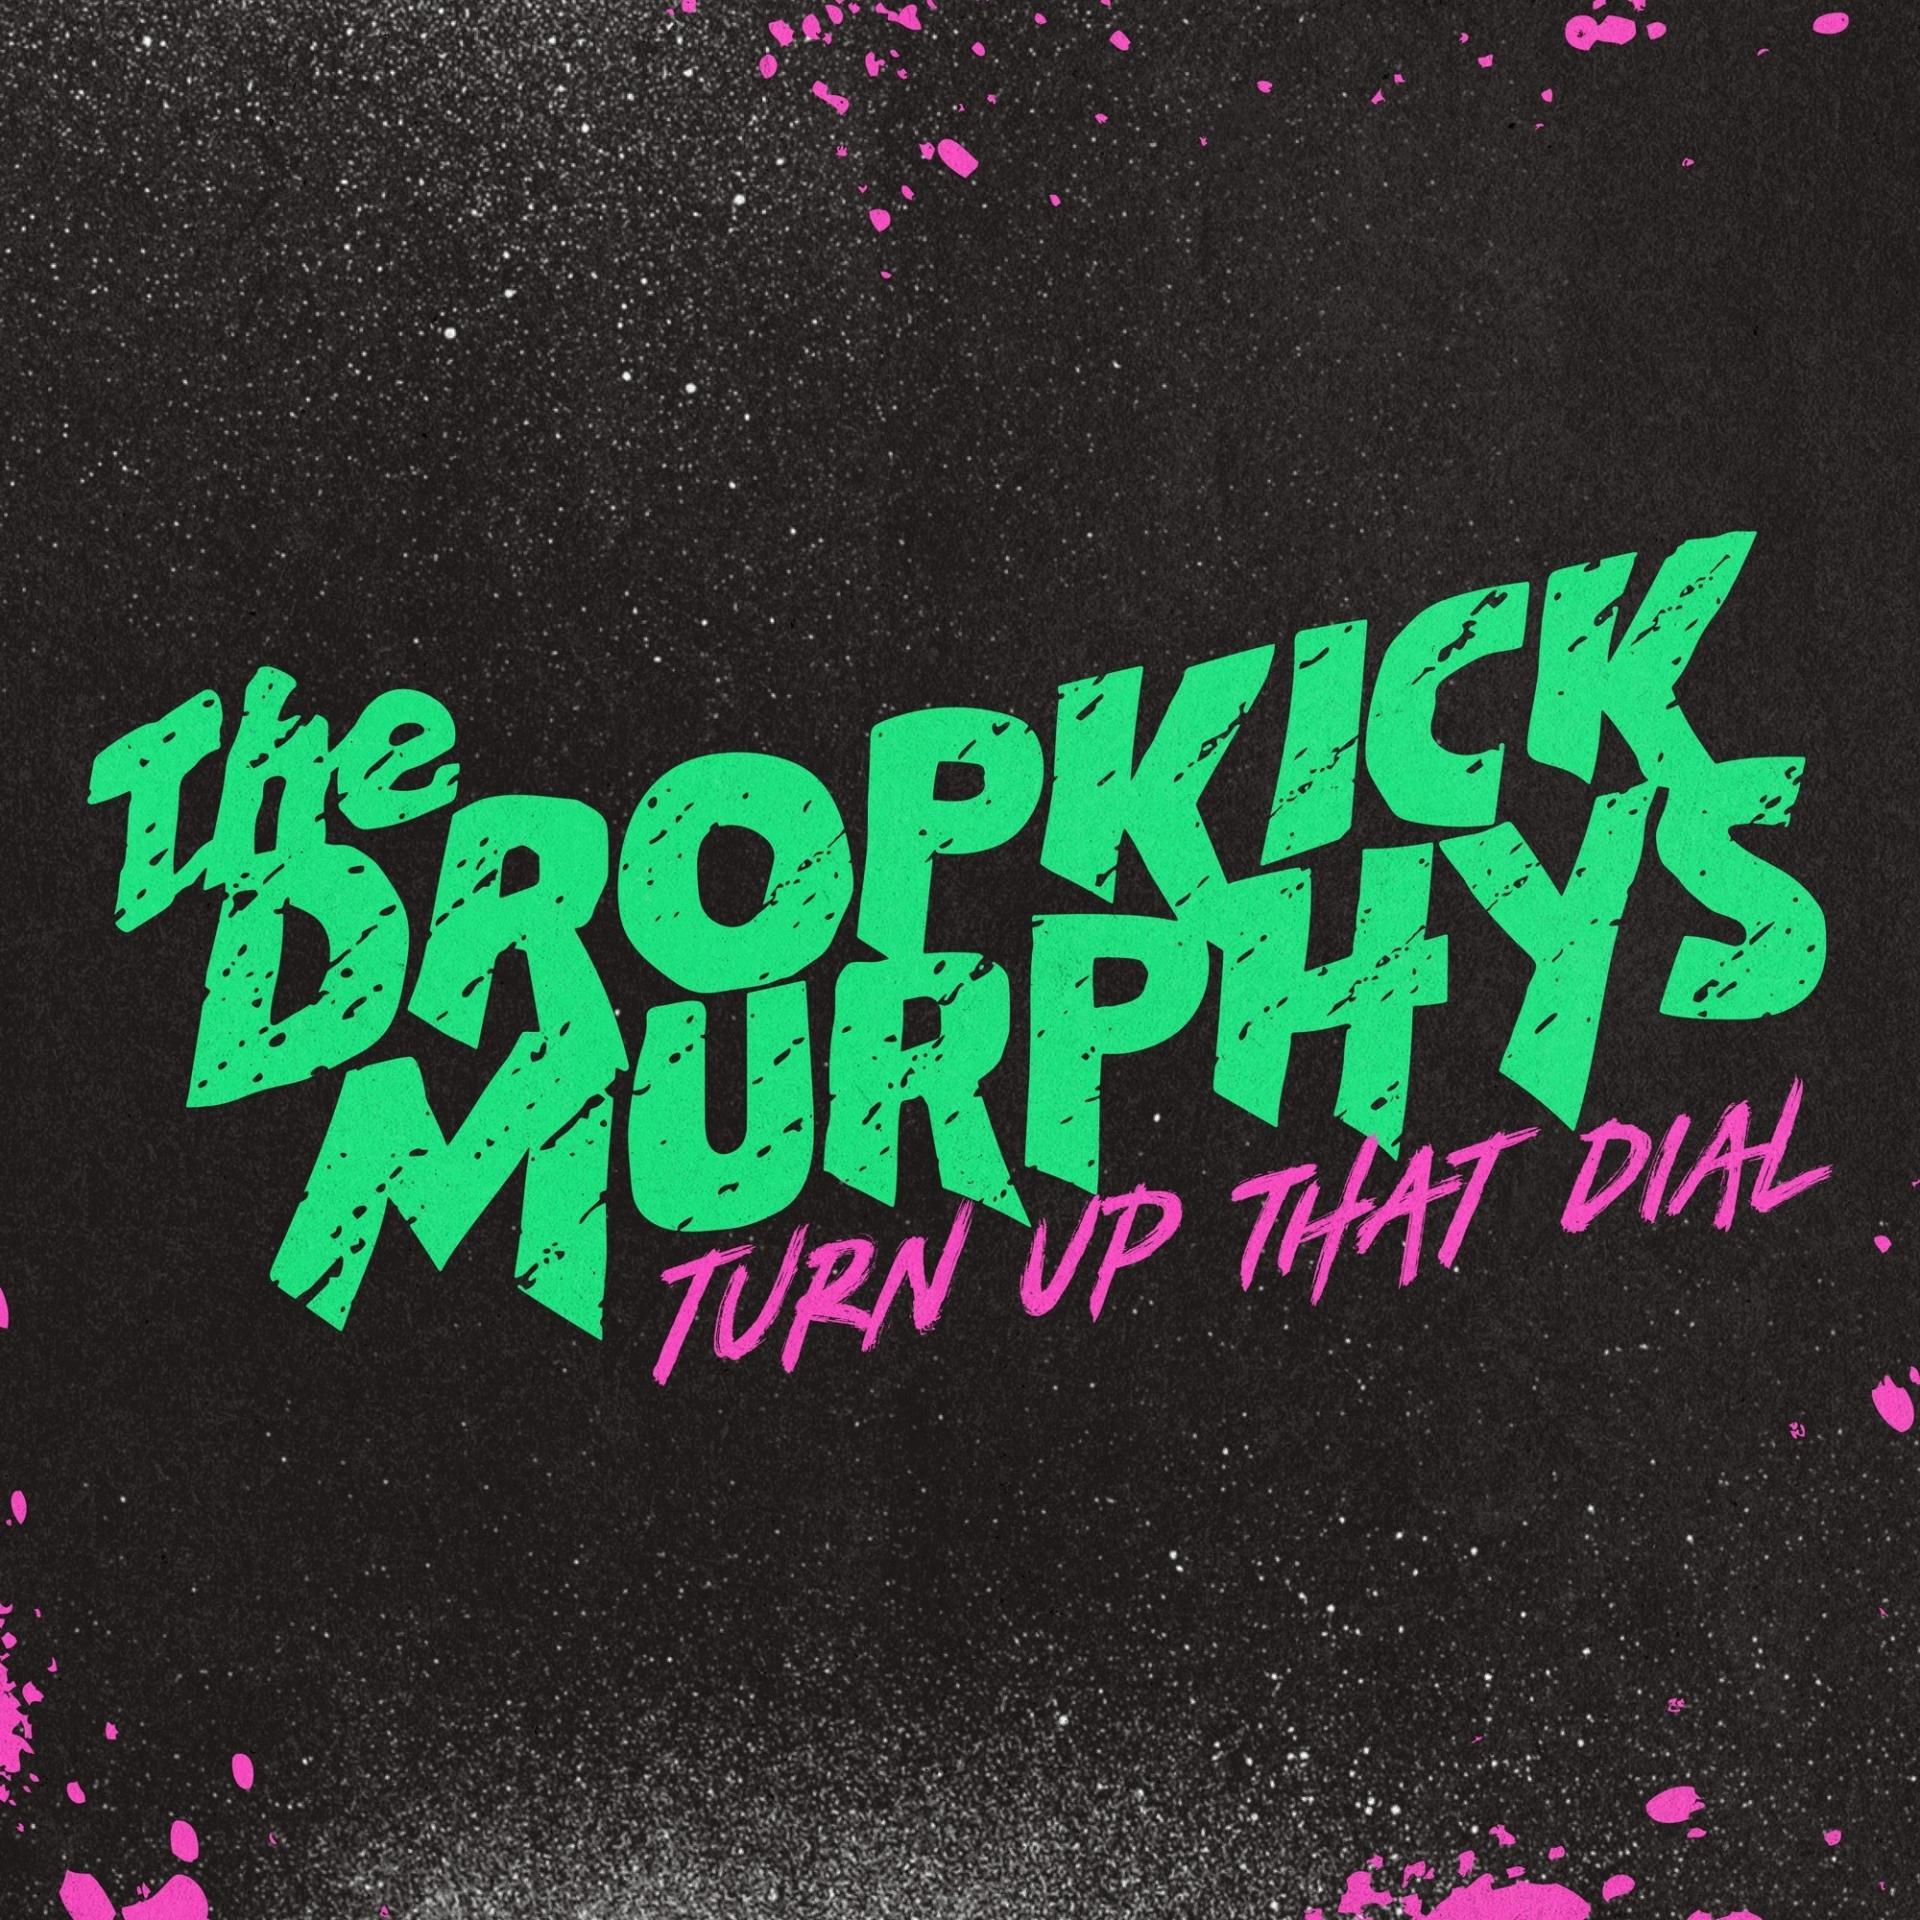 Turn up that dial dropkick murphys